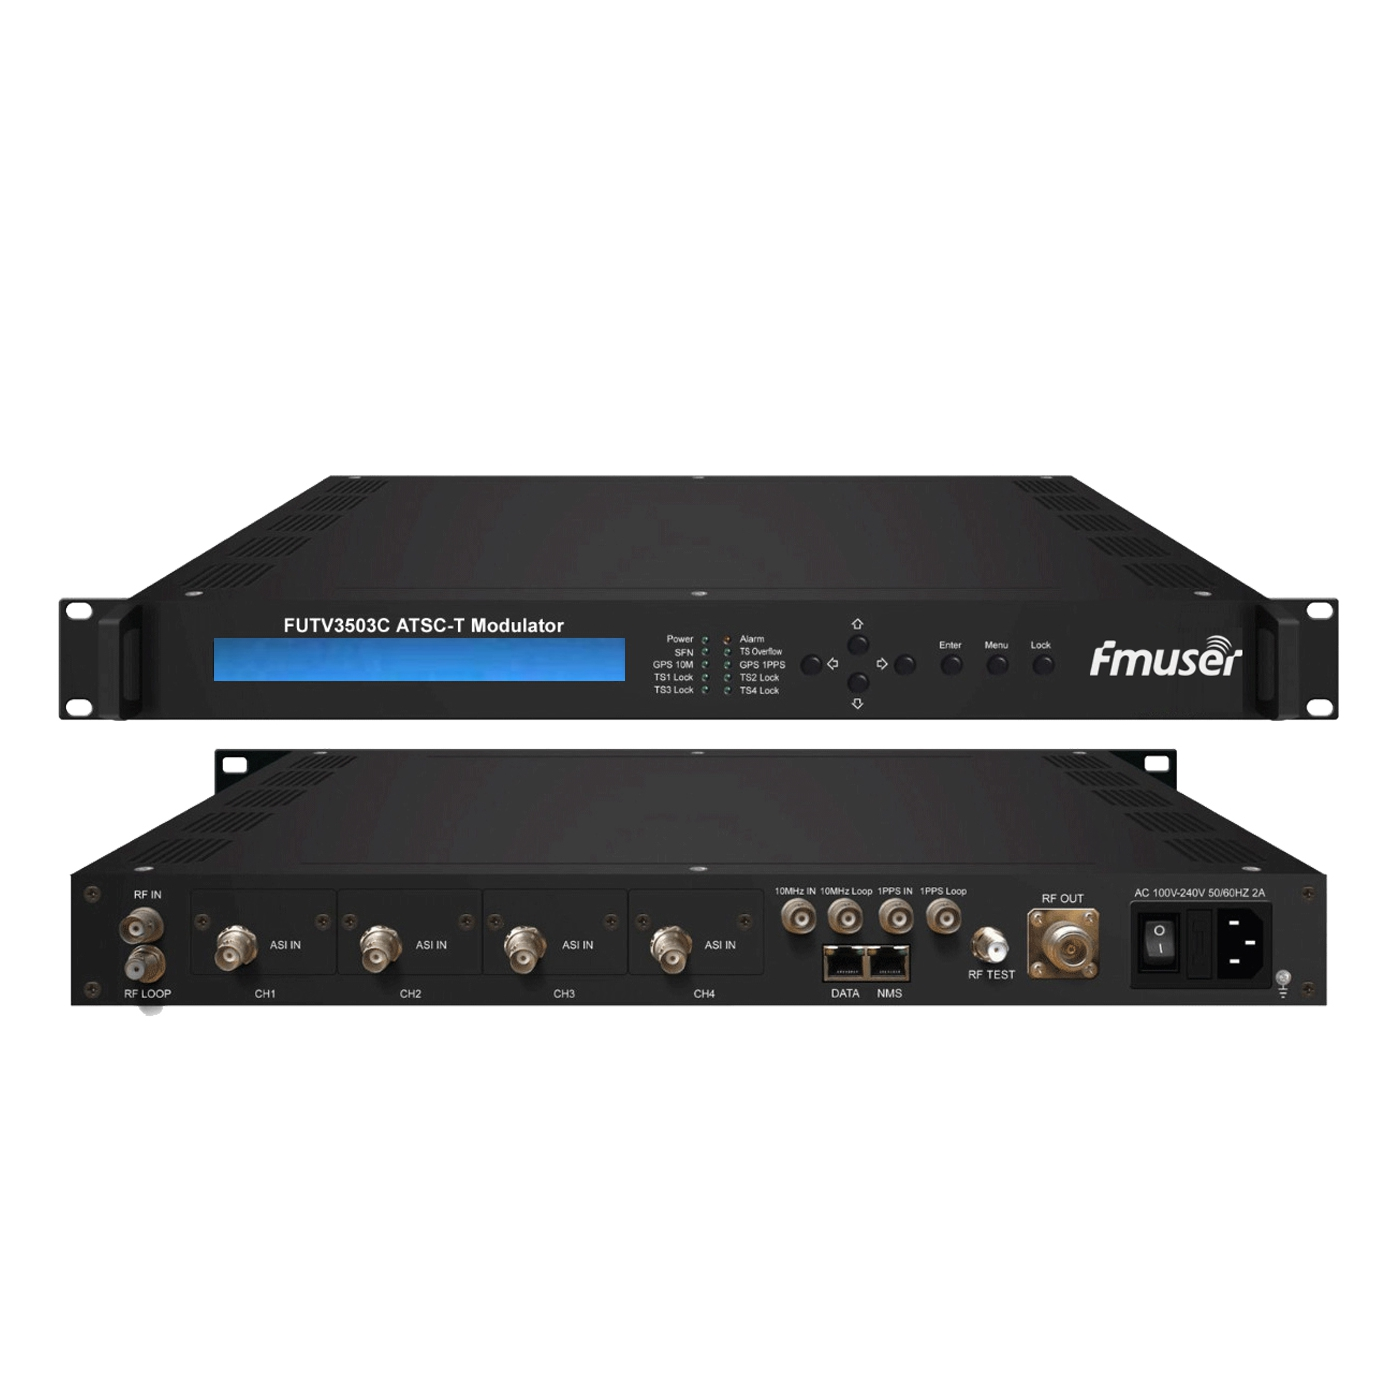 FMUSER FUTV3503C ATSC-T 8VSB Модулятор 8-VSB модуляции РФ (2 * ASI / 2 * SMPTE вход 310M, RF ontput, ATSC 8VSB модуляция) с управлением сети